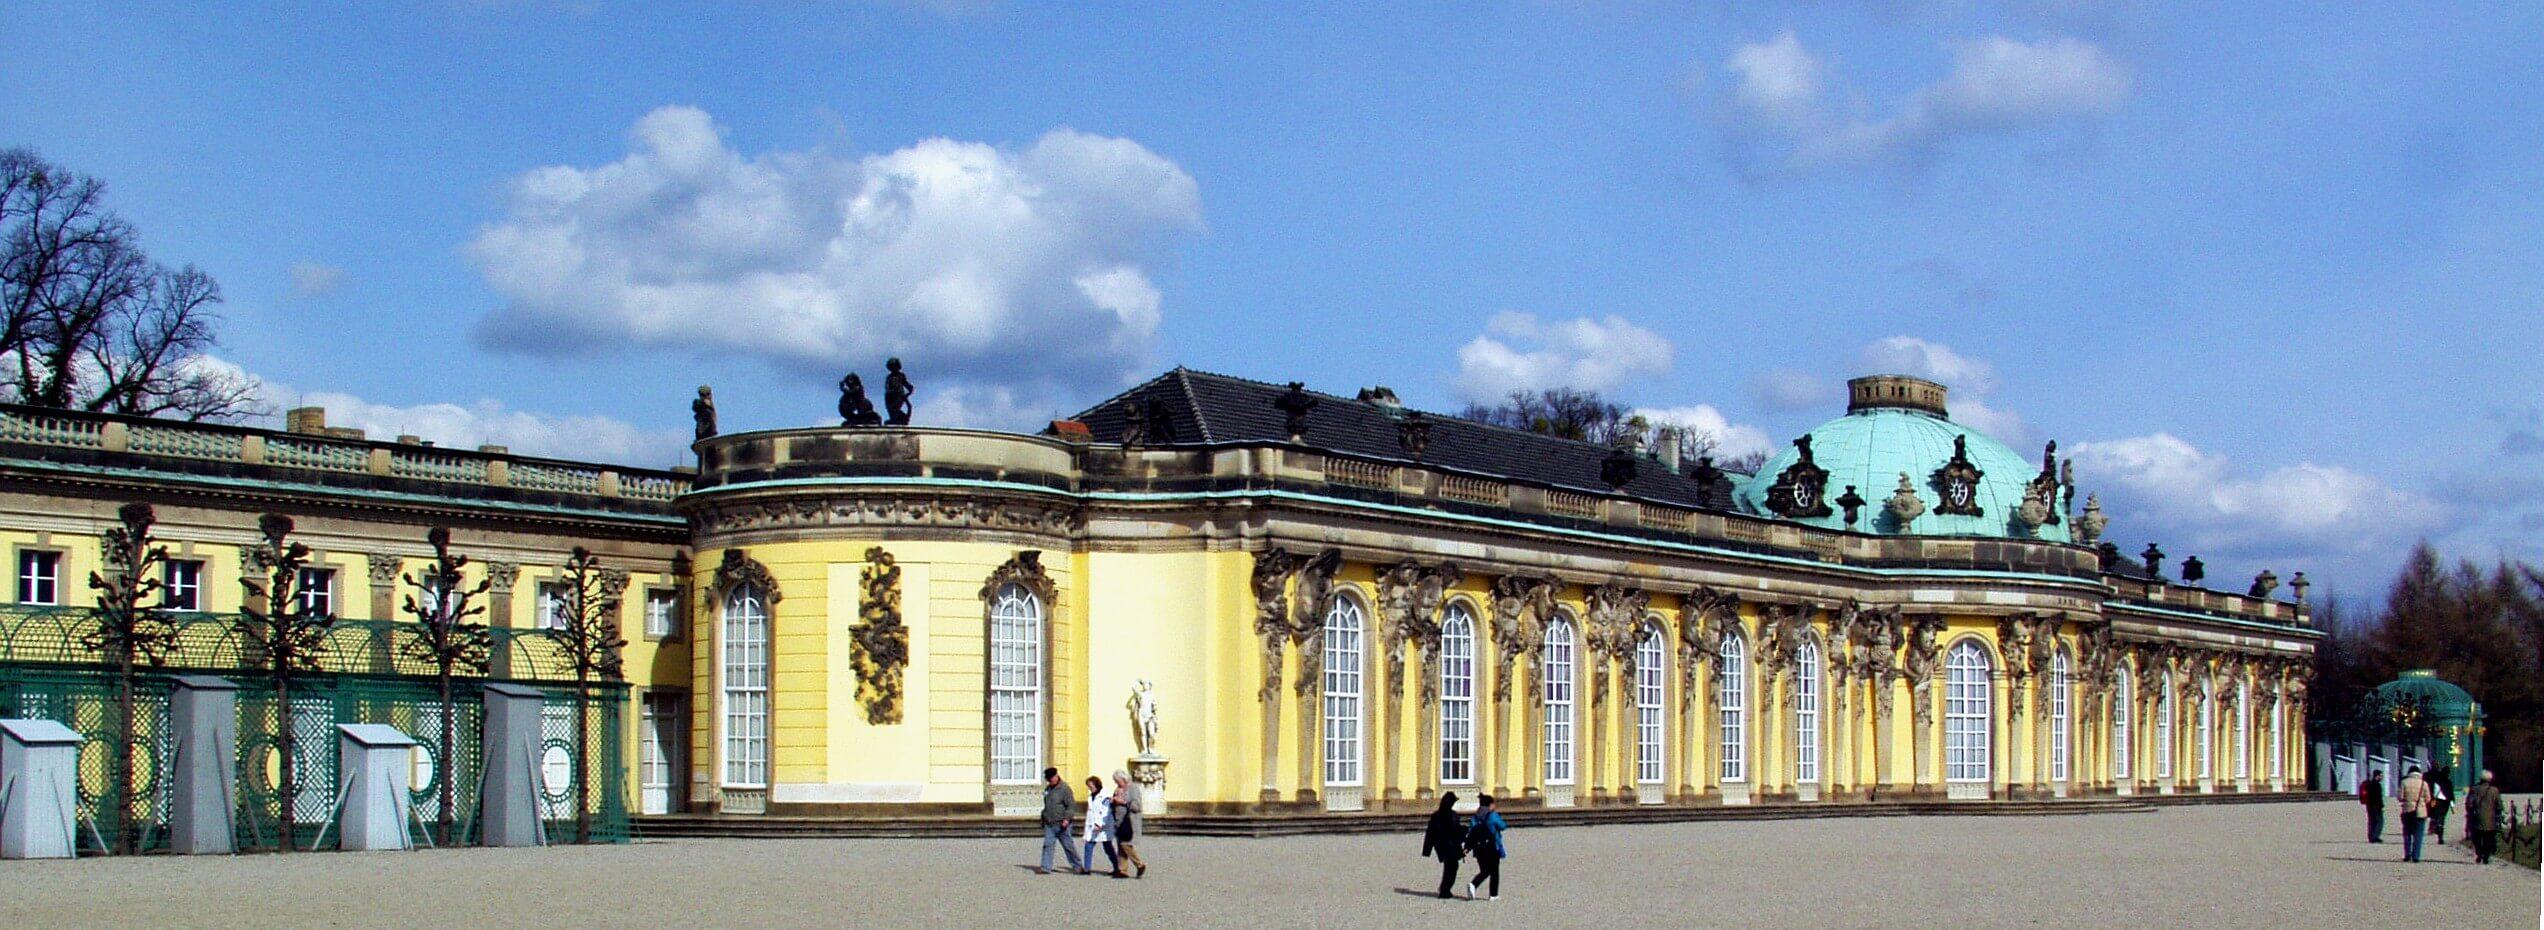 Schloss Sanssouci Photo credit: wikipedia commons